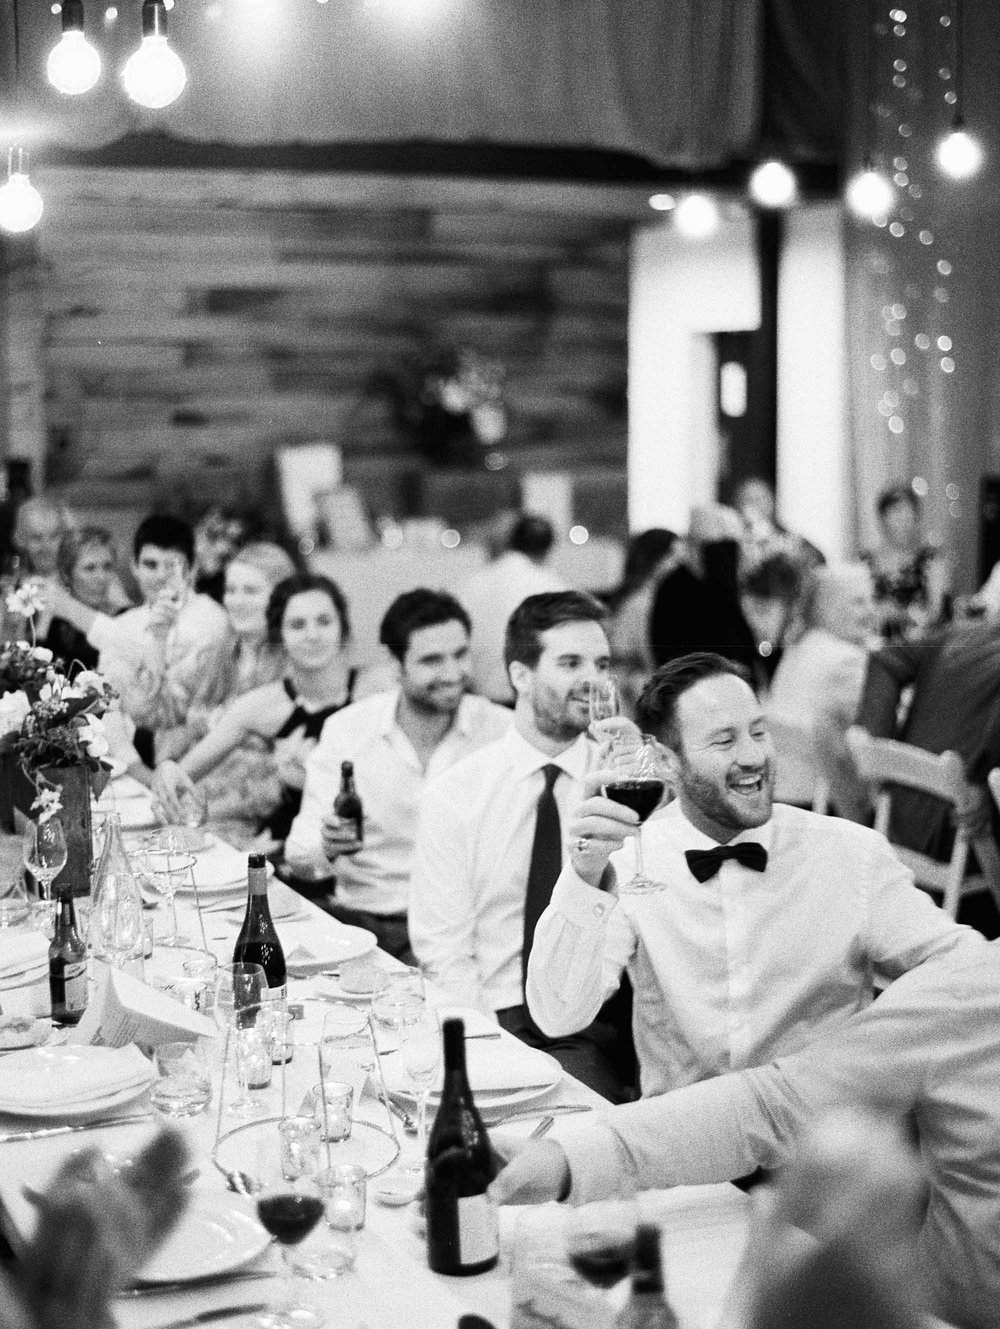 Golding-Wines-wedding-photography-113.jpg